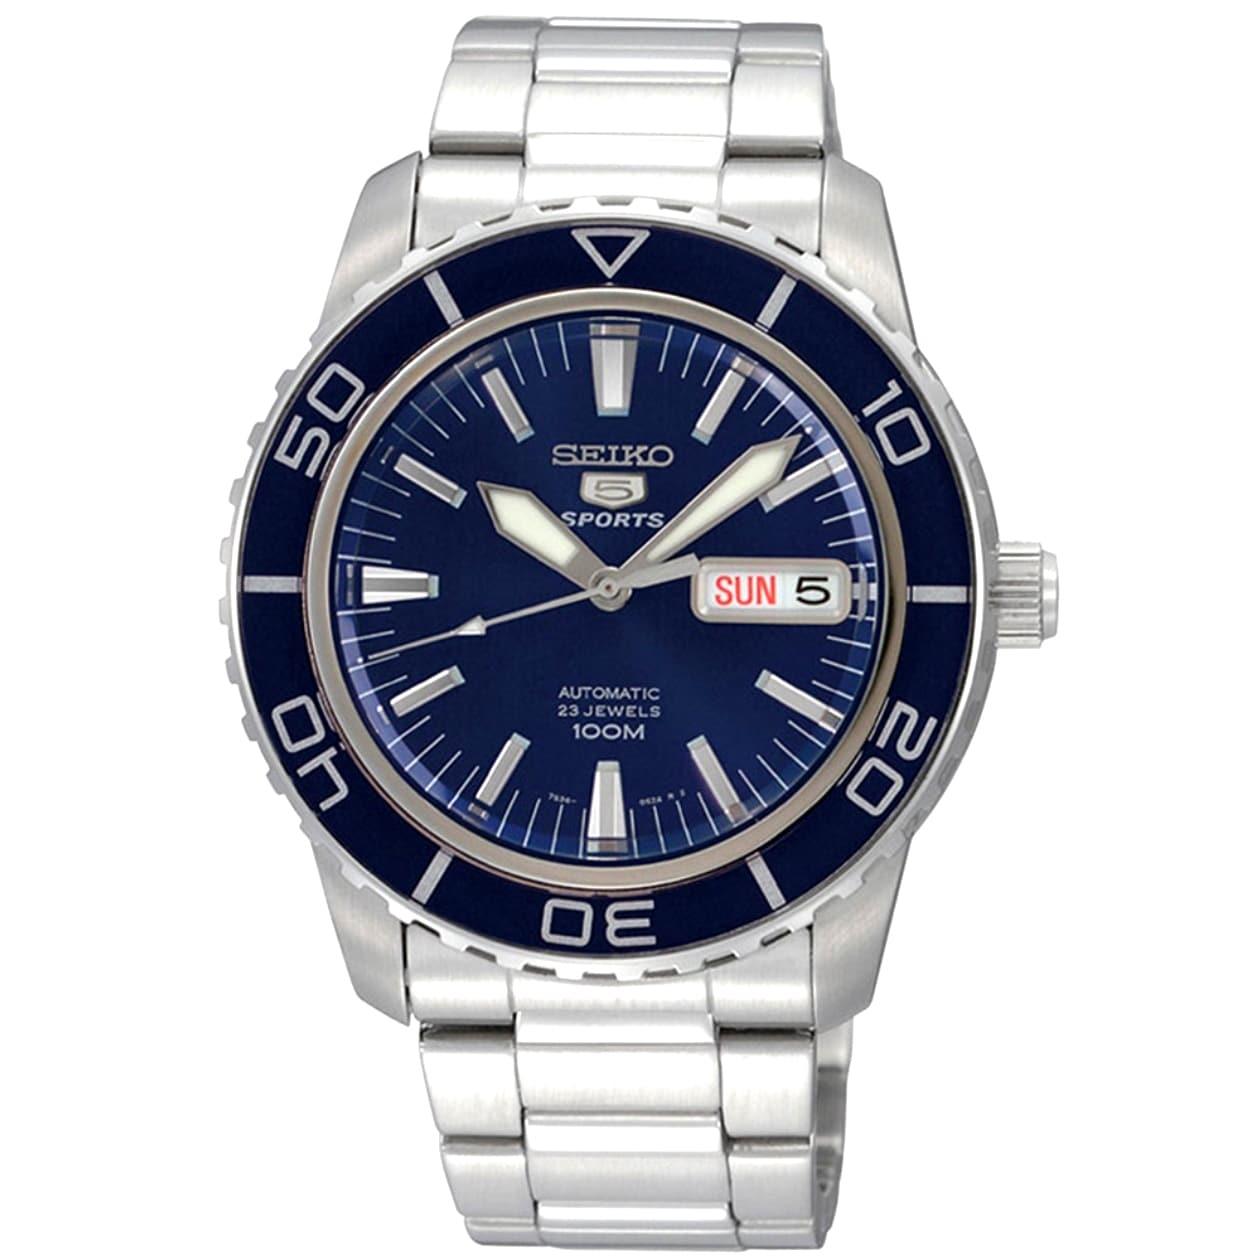 Seiko 5 Men's SNZH53K1 Sports Blue Watch (Blue), Size One...